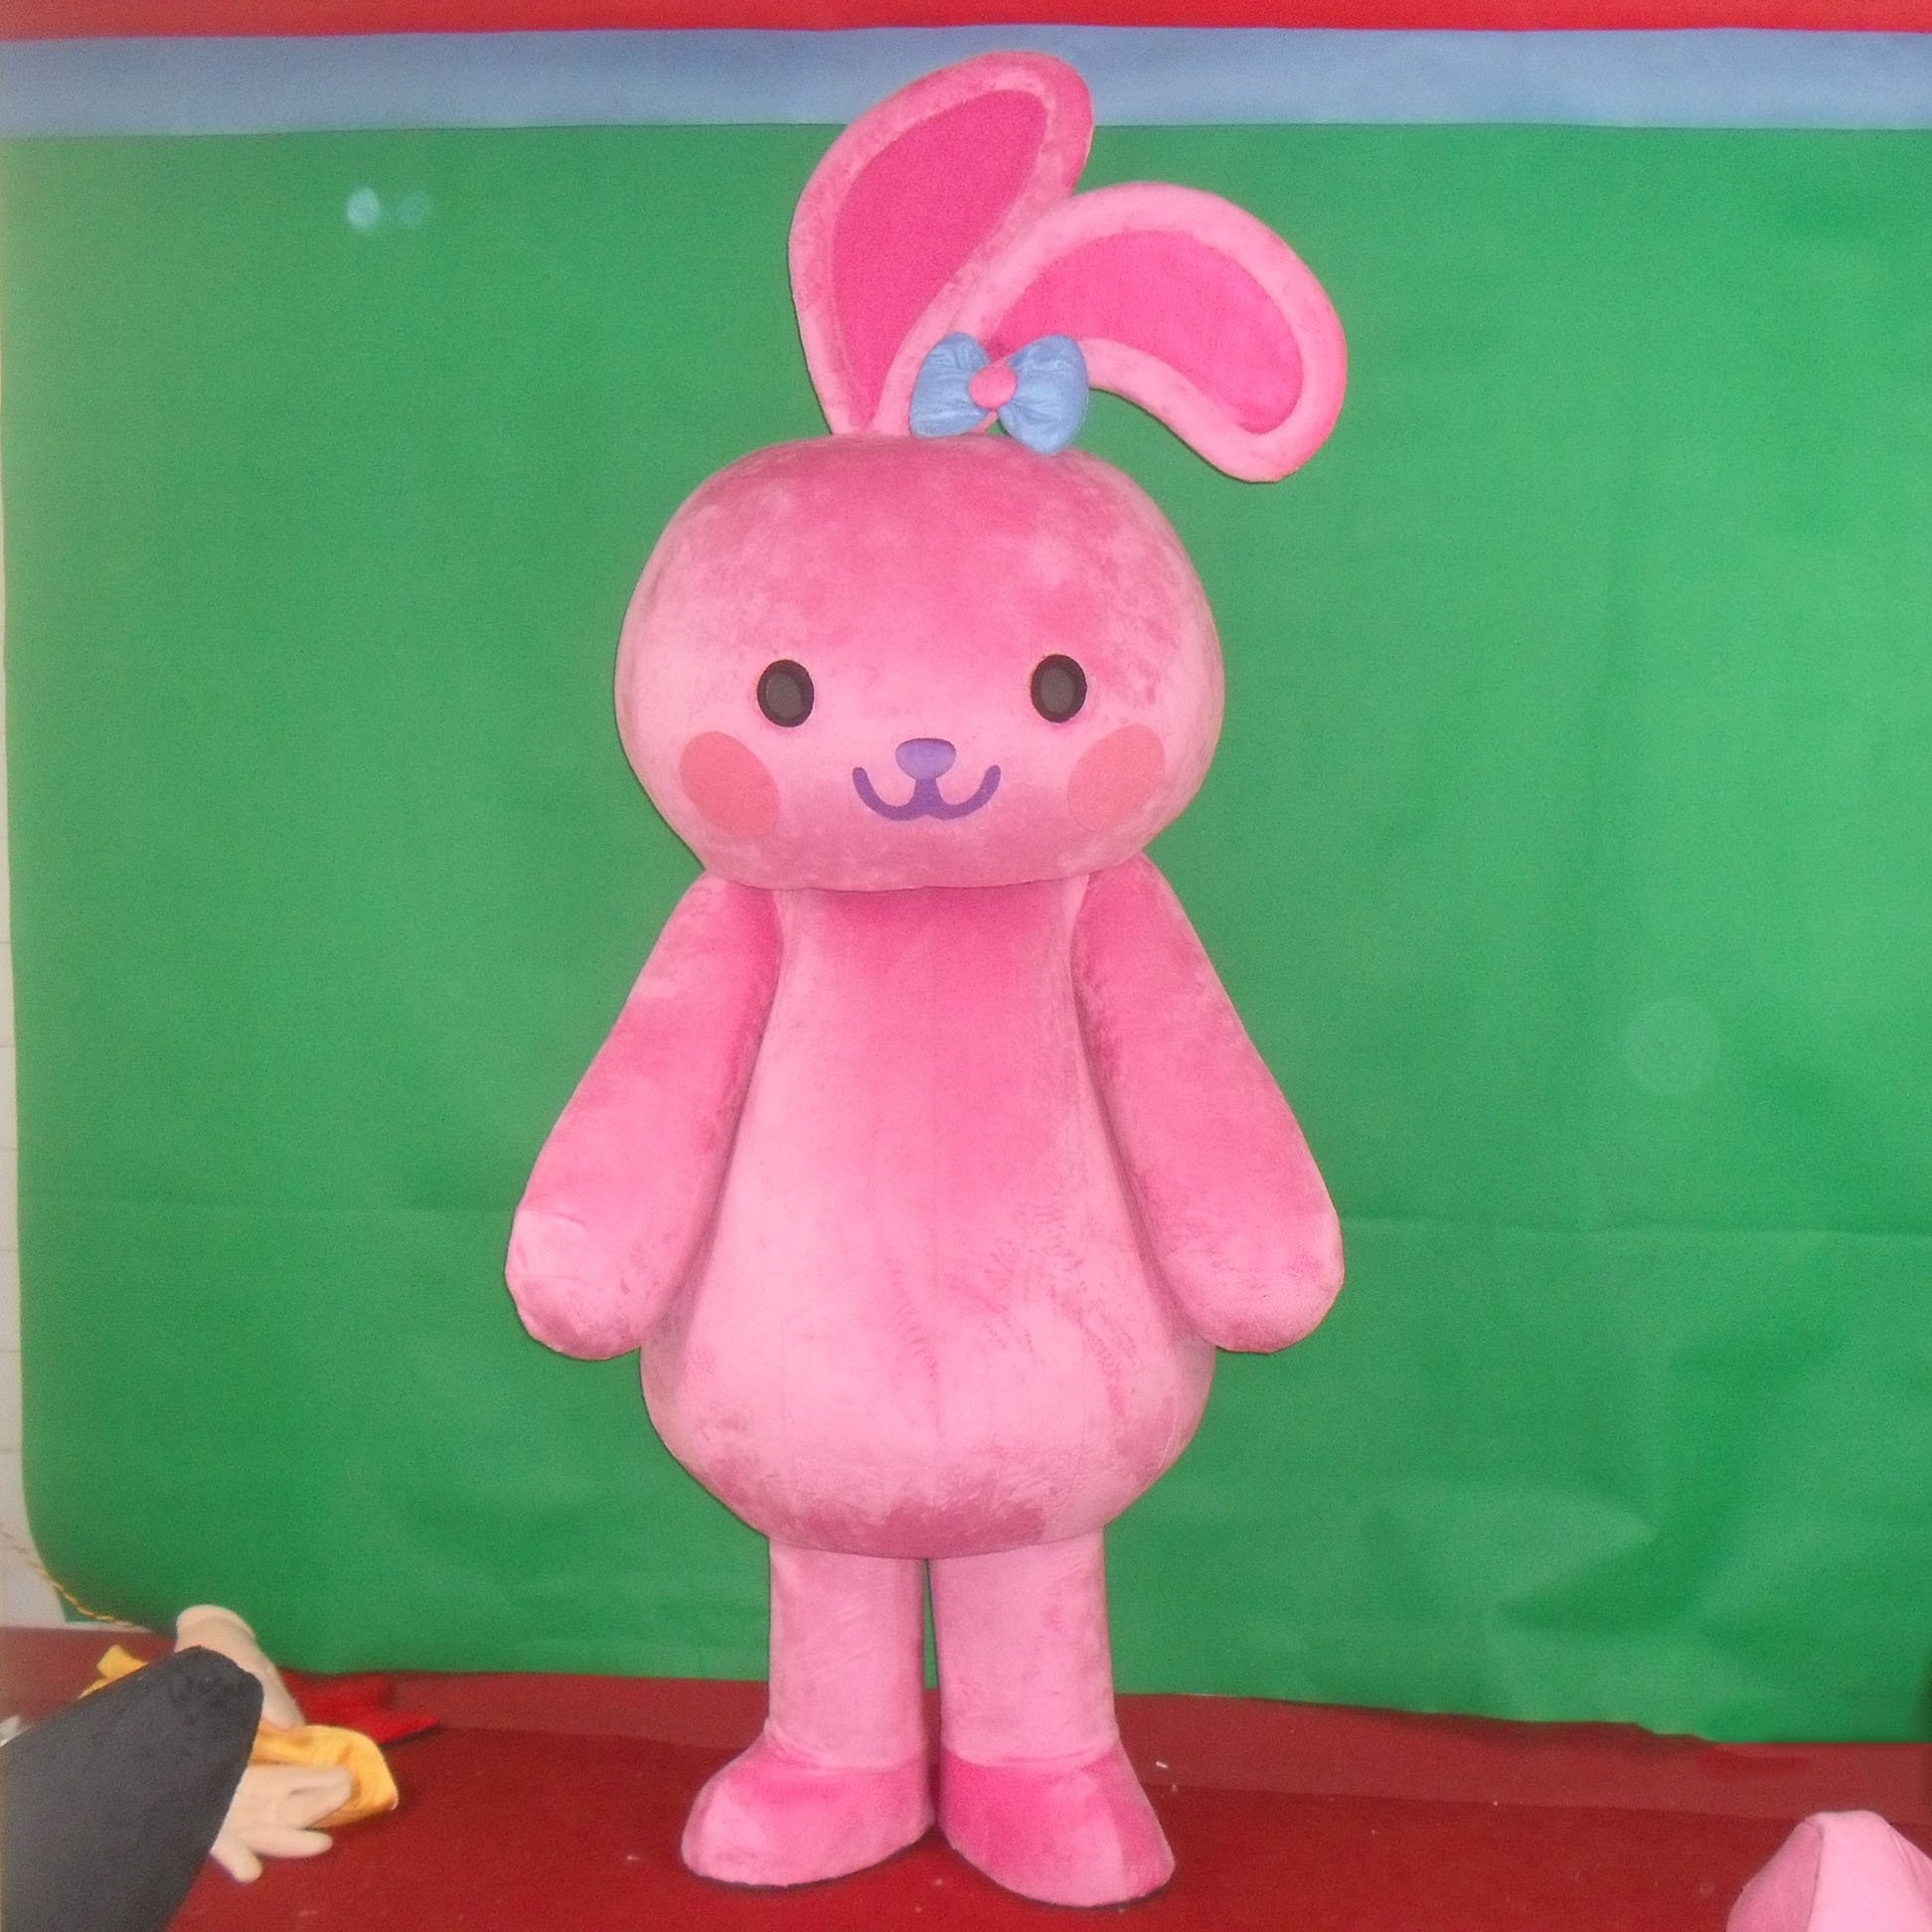 Cute Bunny Cartoon Doll Clothing Cartoon Walking Doll Clothing Cartoon Show Clothing Pink Rabbit Doll Clothing Mascot Costume